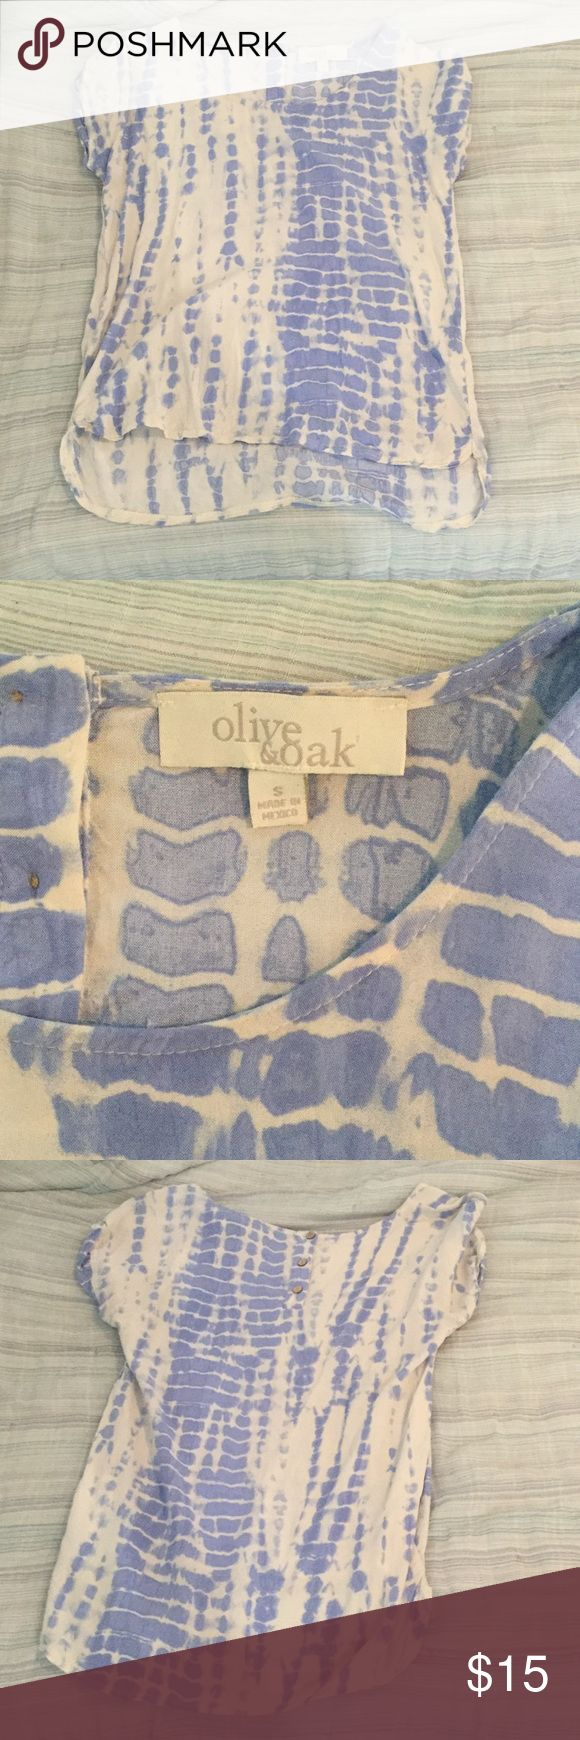 O+O blue/white top, Small Olive and Oak, light blue and white, short sleeve top, Small. Cute button detail on back Olive & Oak Tops Tees - Short Sleeve